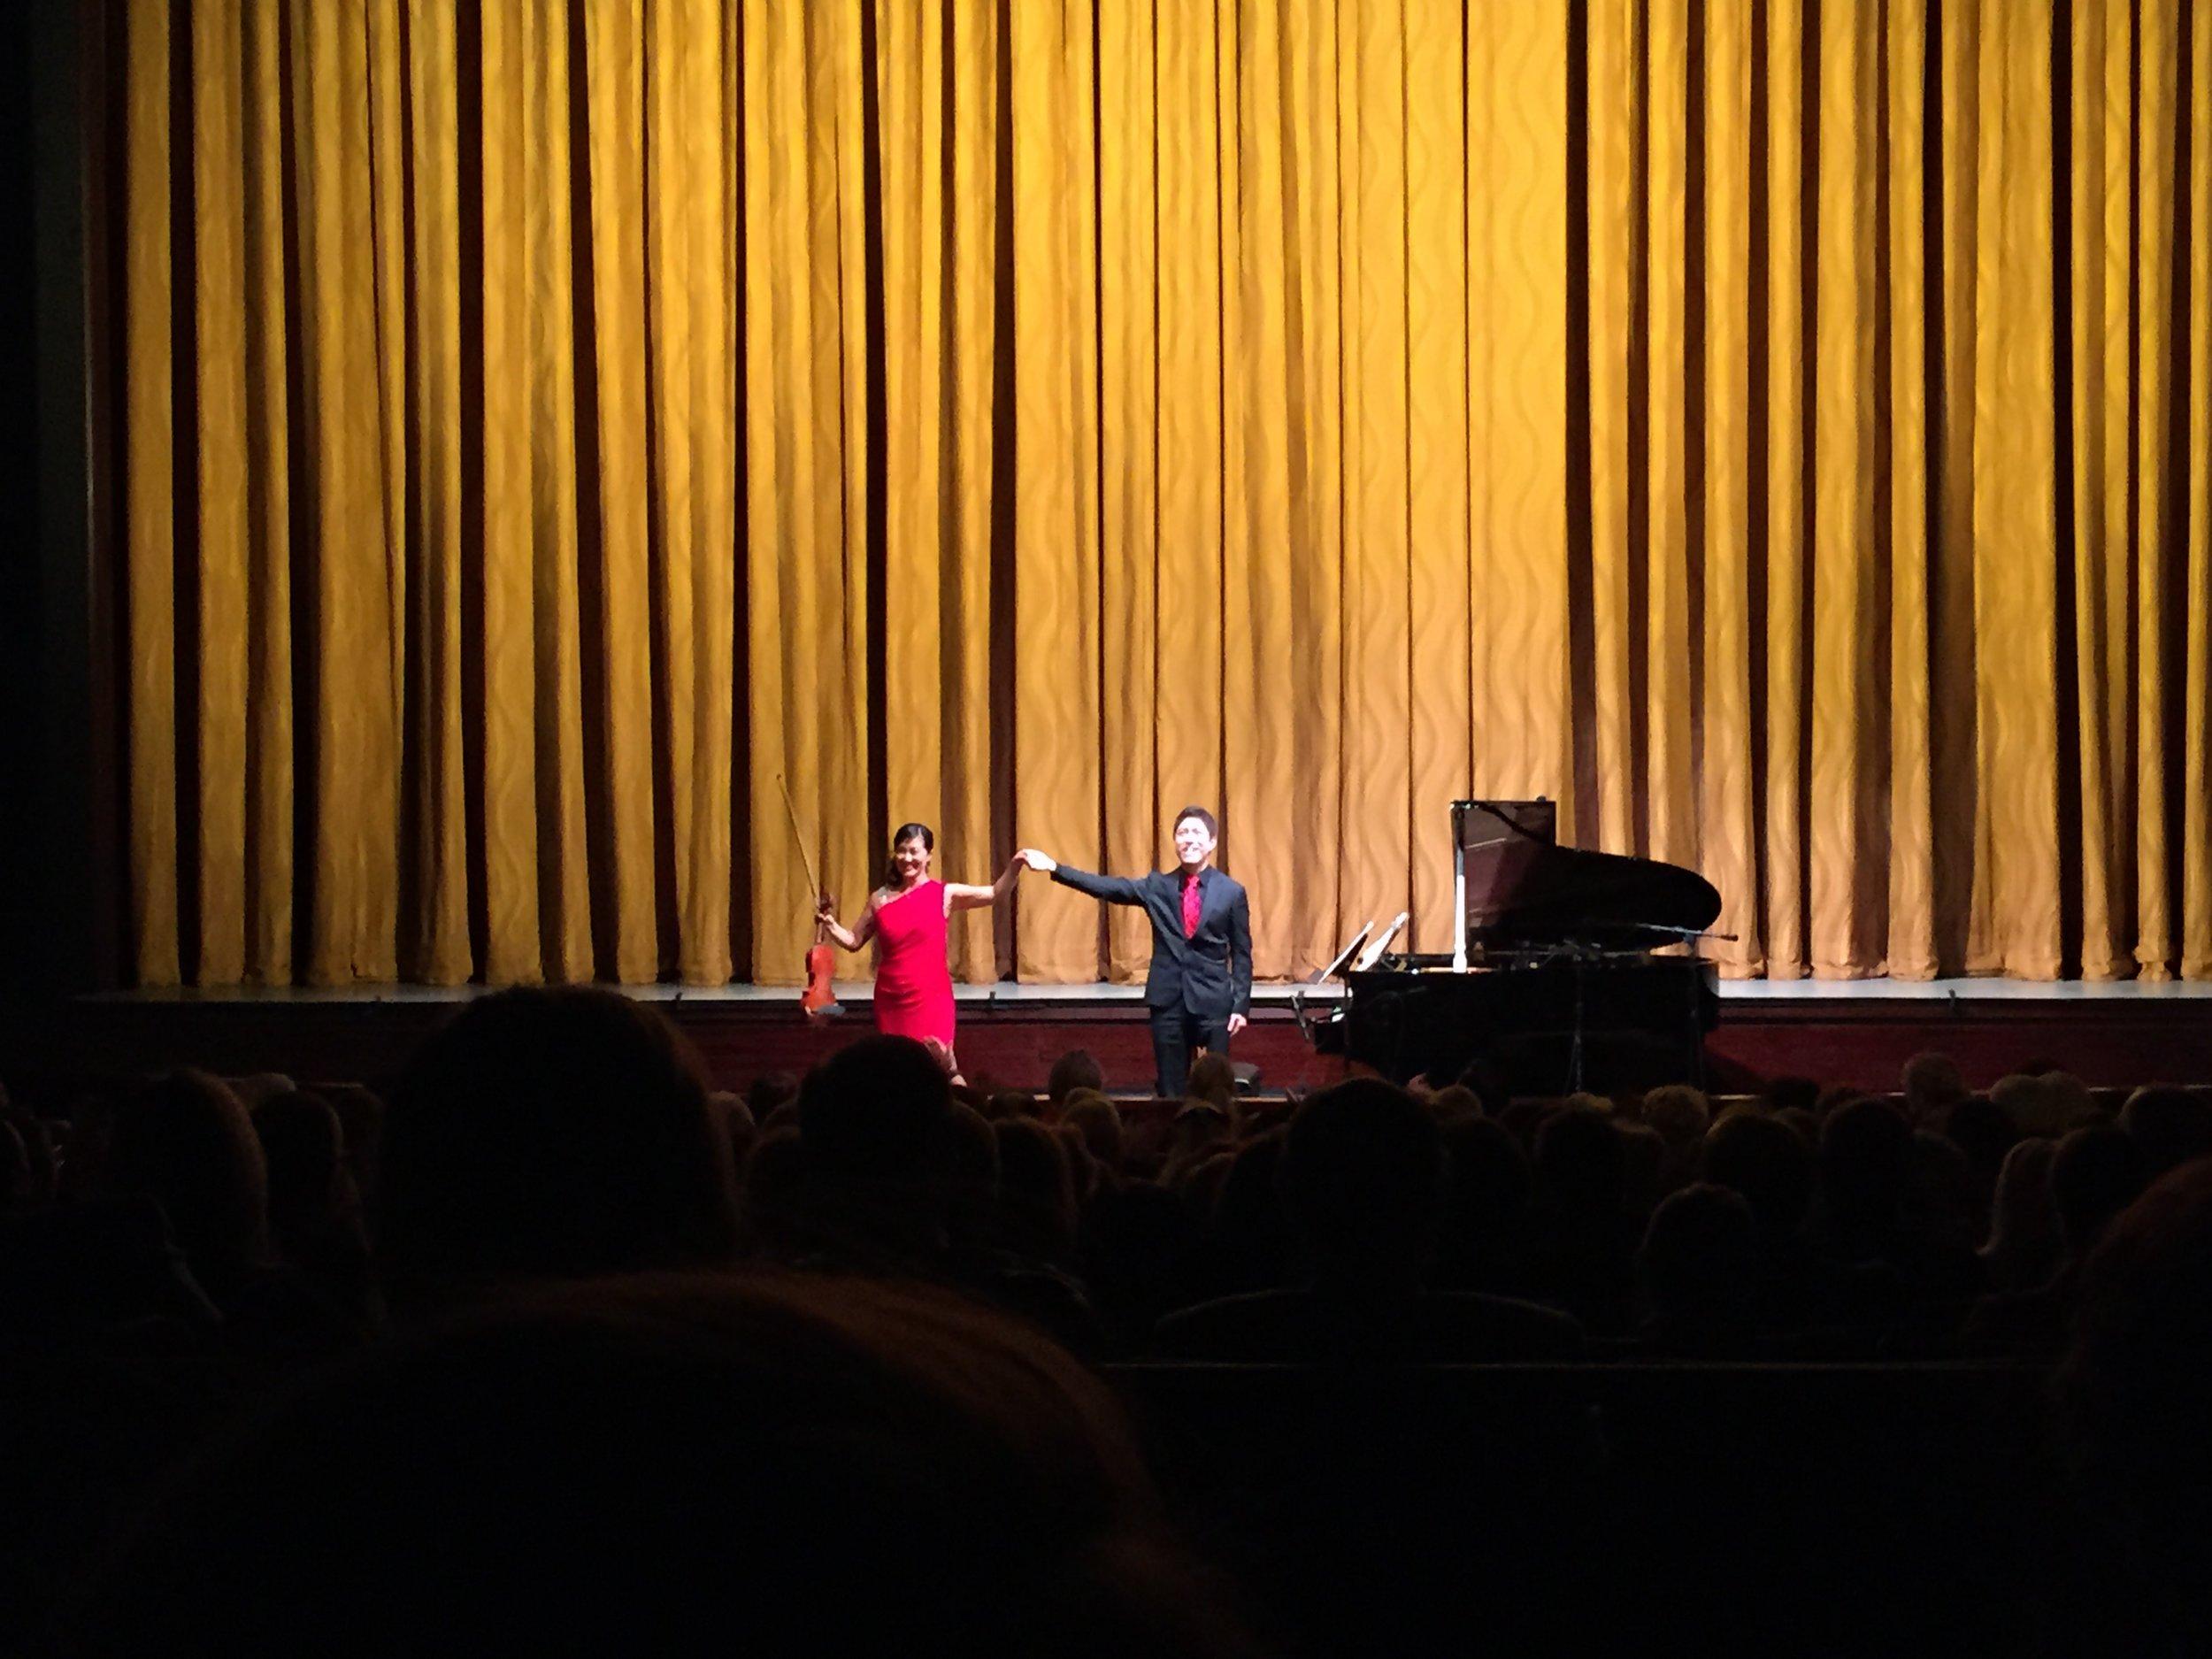 Machiko Ozawa and Ryo Yanagitani performed at Kennedy Center's Eisenhower Theatre in Oct, 2015